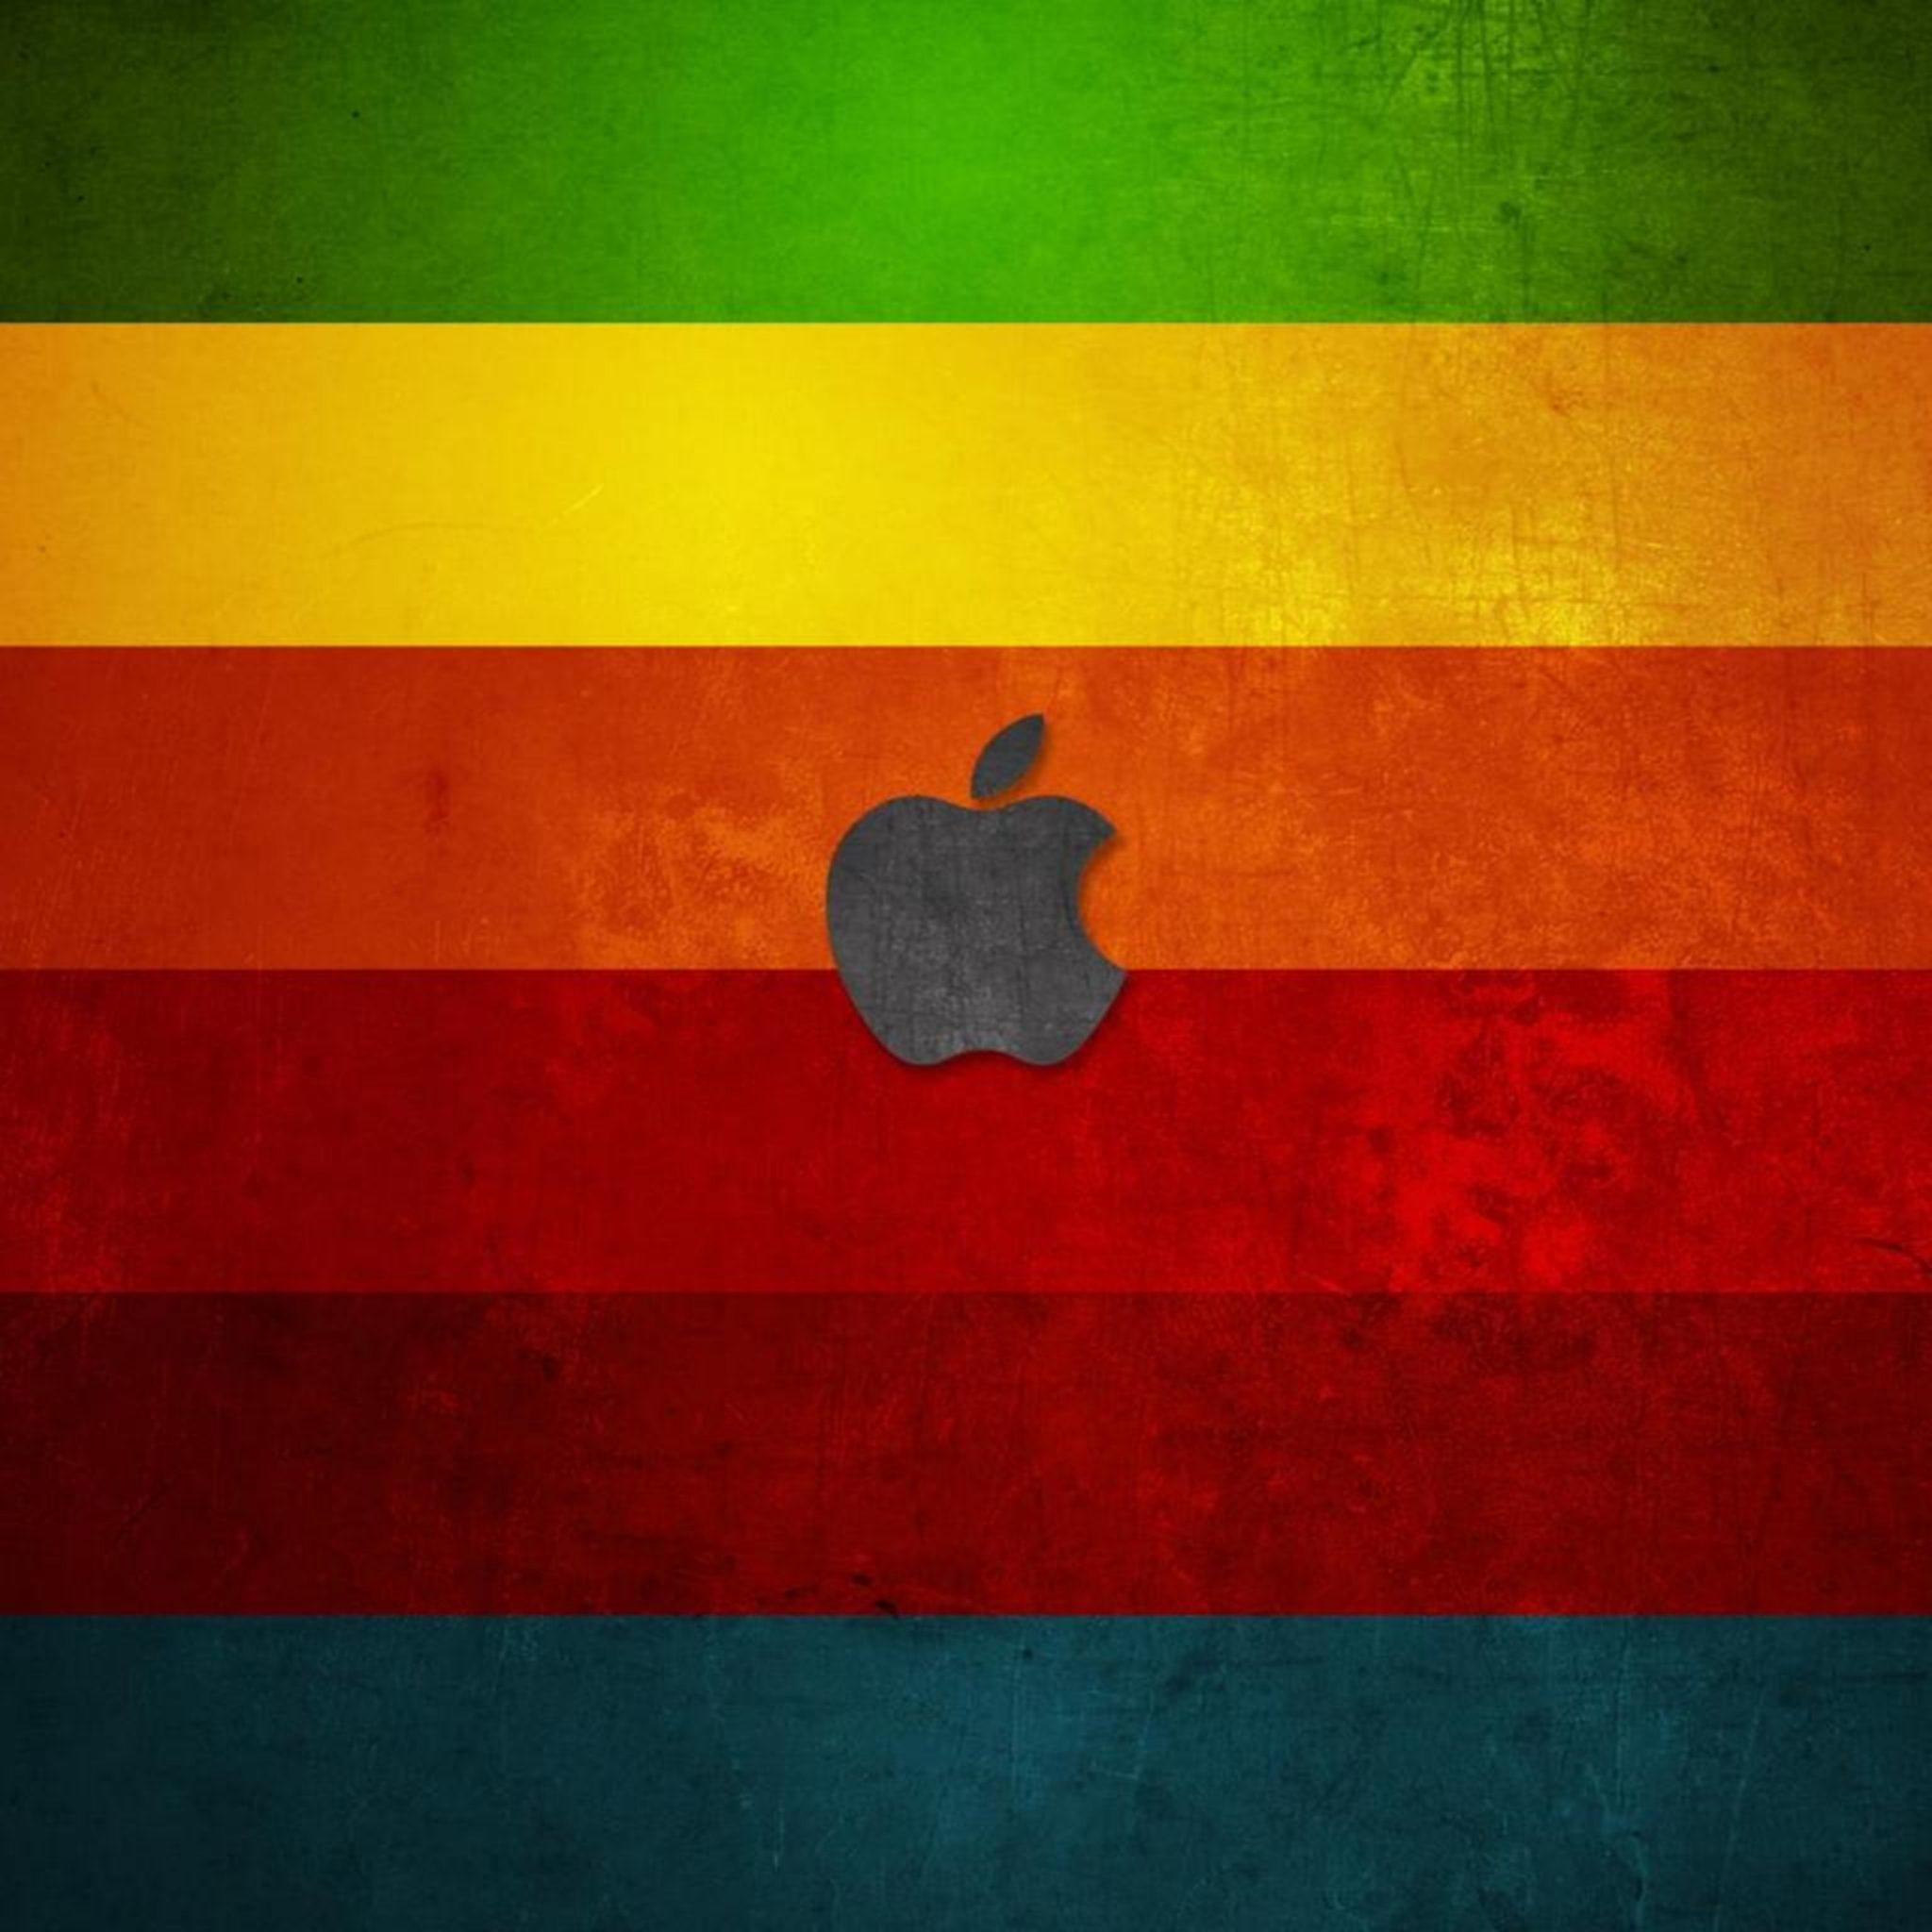 2048x2048 wallpapers iPad retina Apple With Colors Ipad Wallpaper 2048x2048 pixels resolution